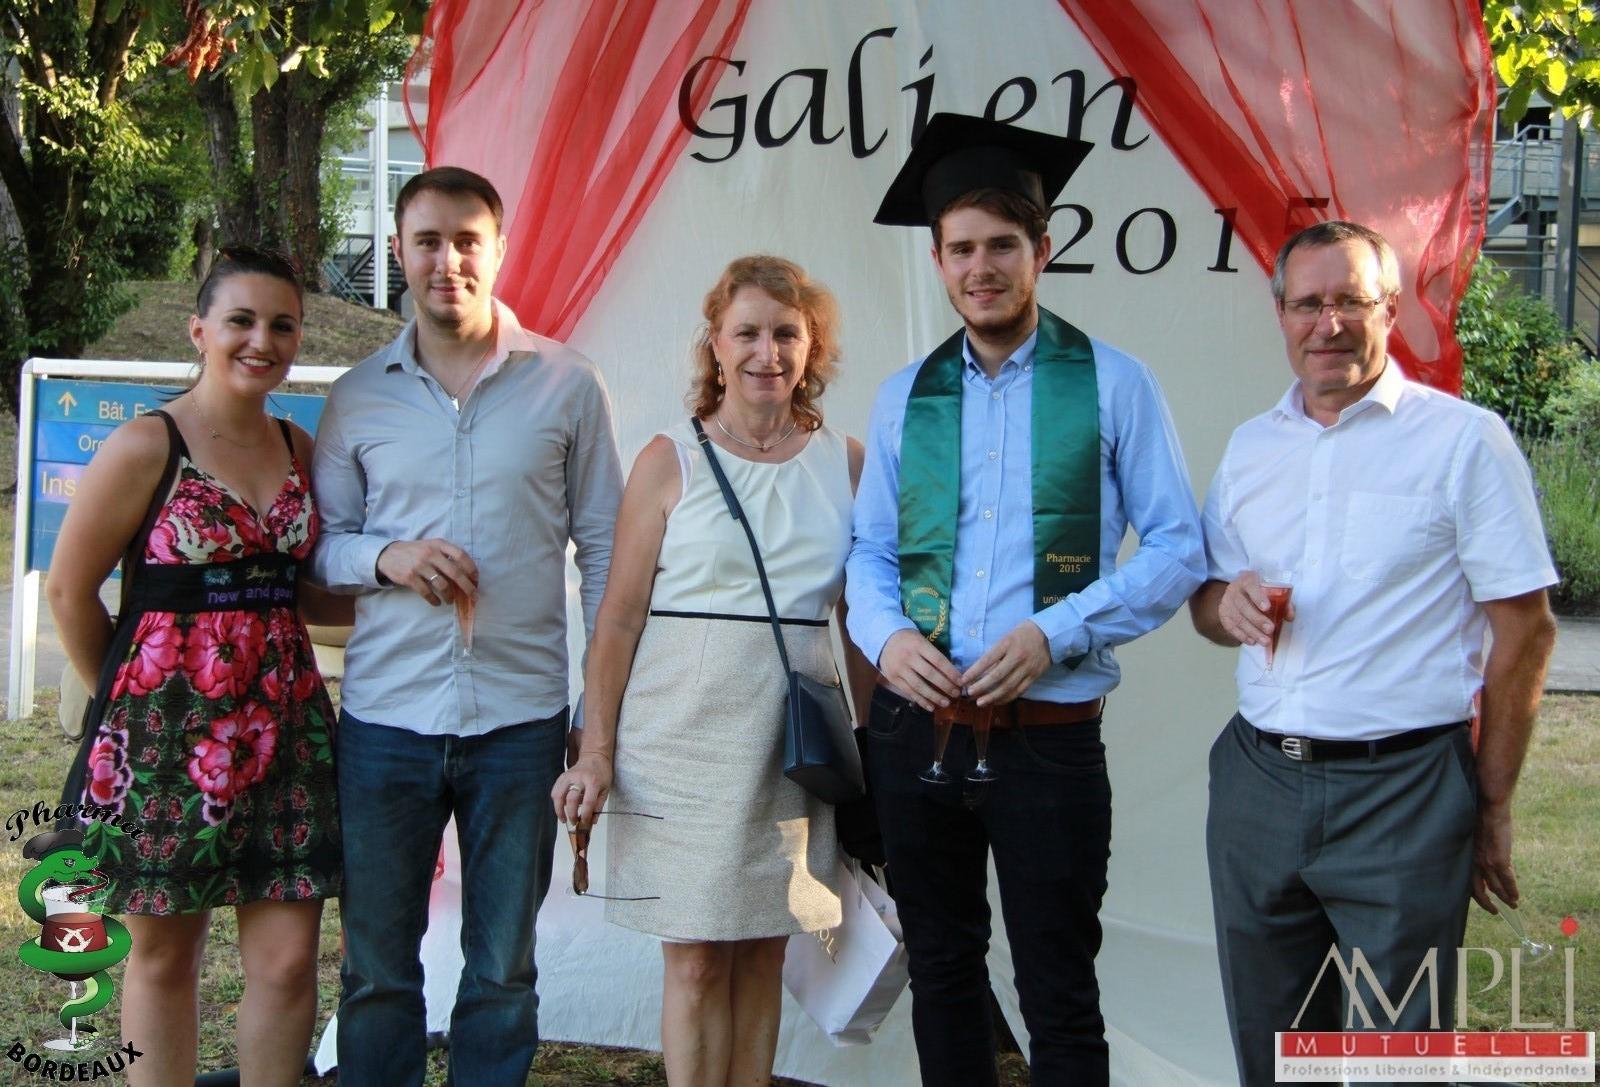 Serment Galien Bordeaux 2015 (124).JPG